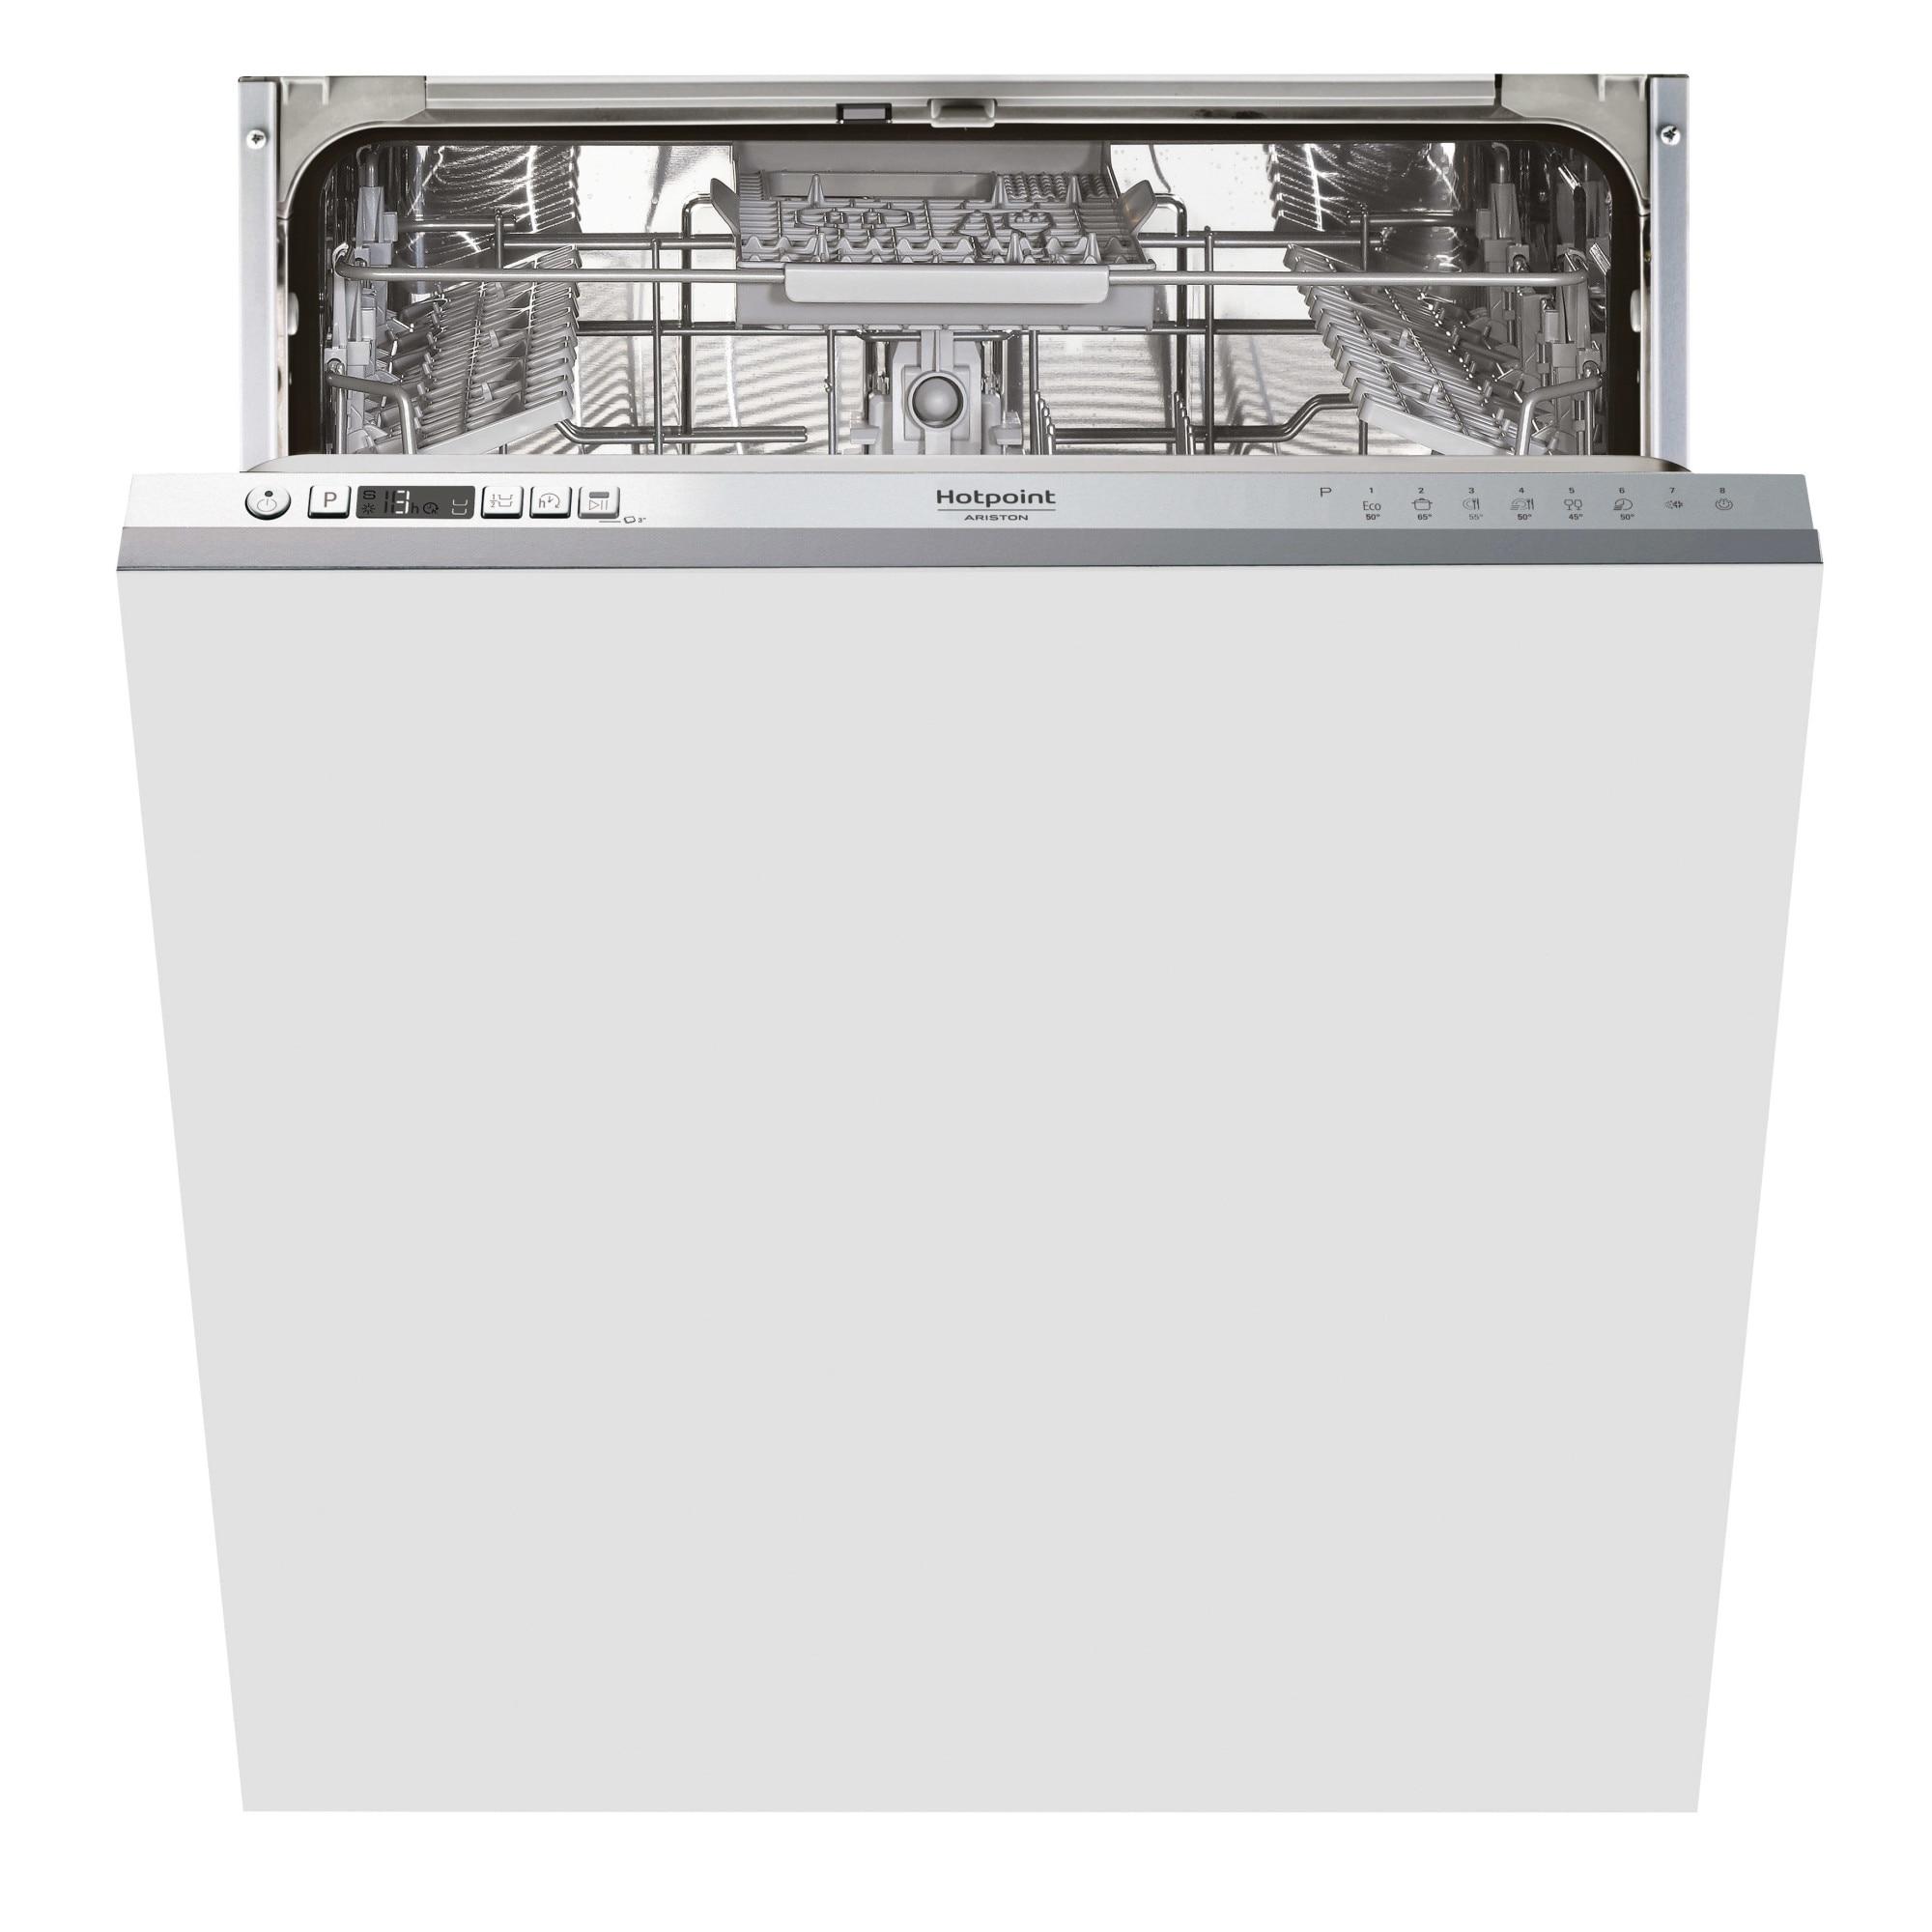 Fotografie Masina de spalat vase incorporabila Hotpoint HIC3C26, 14 seturi, 8 programe, Clasa E, Zone Wash 3D, Sistem ActivEco, 59.8 cm